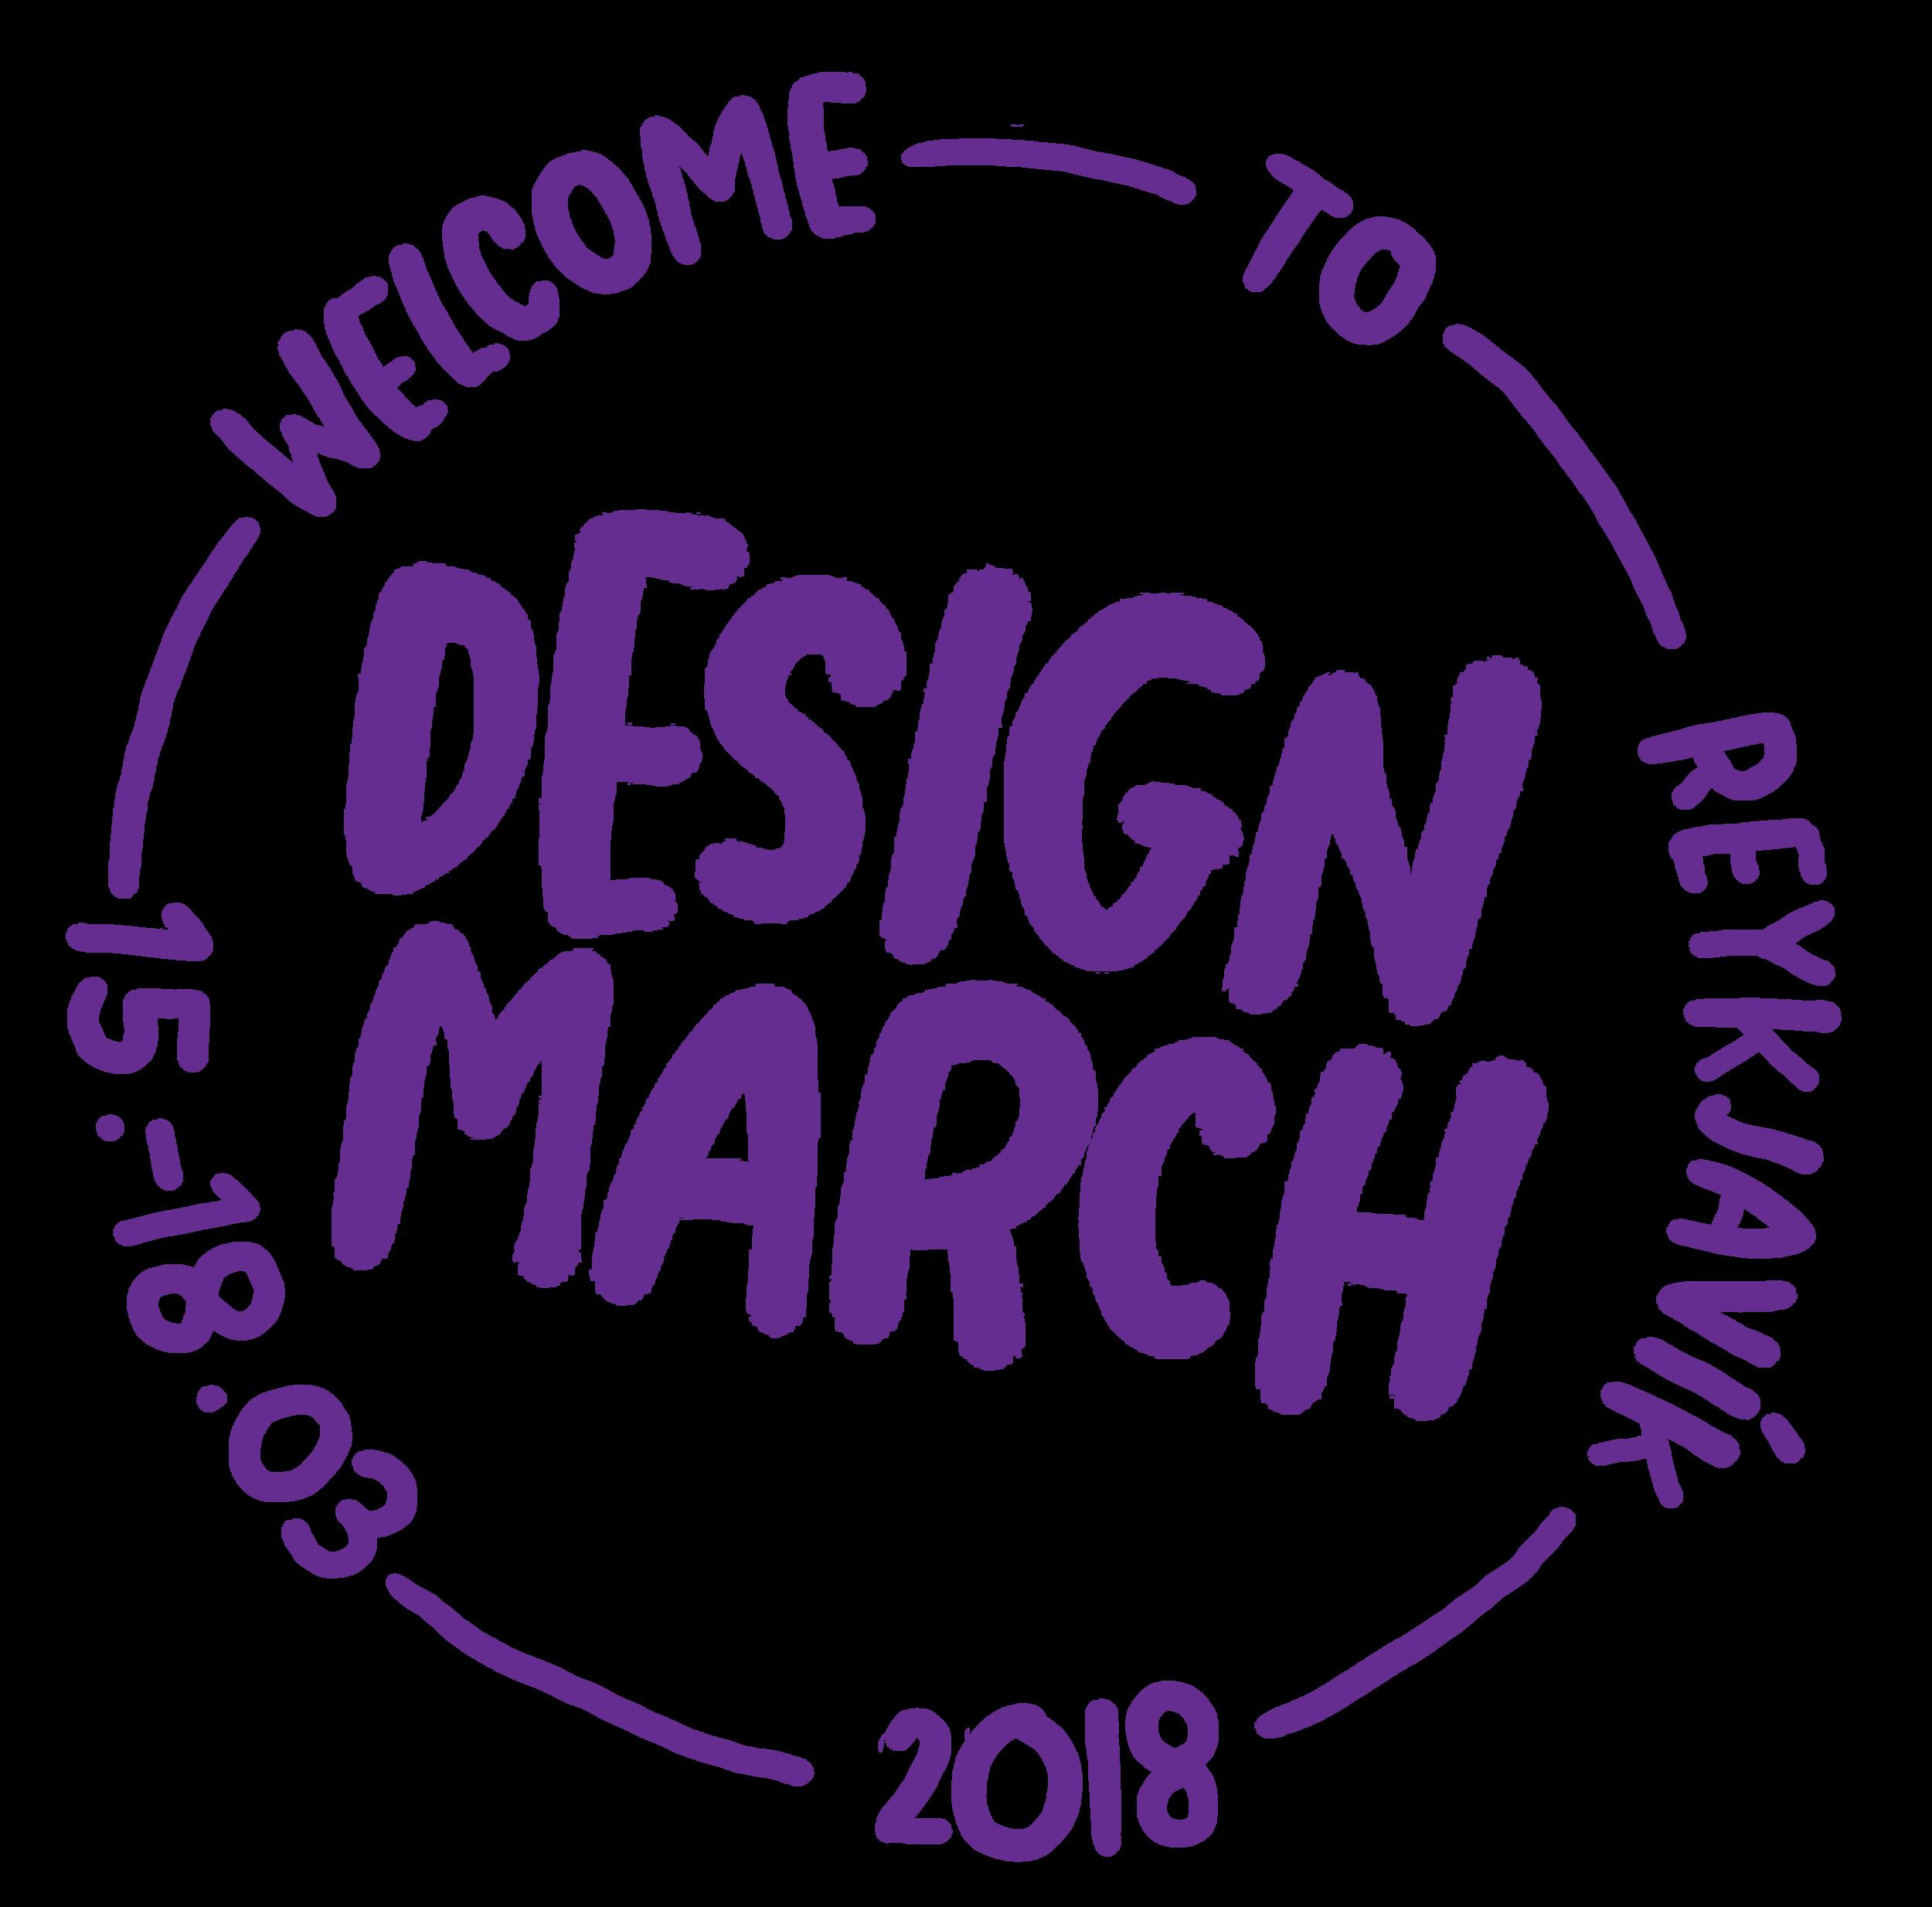 Design+a+March+brand+identity+ +tomasdottir.+ +logo+design,+pattern+design,+online+marketing,+festival+design,+branding,+illustration,+modern,+icon+design